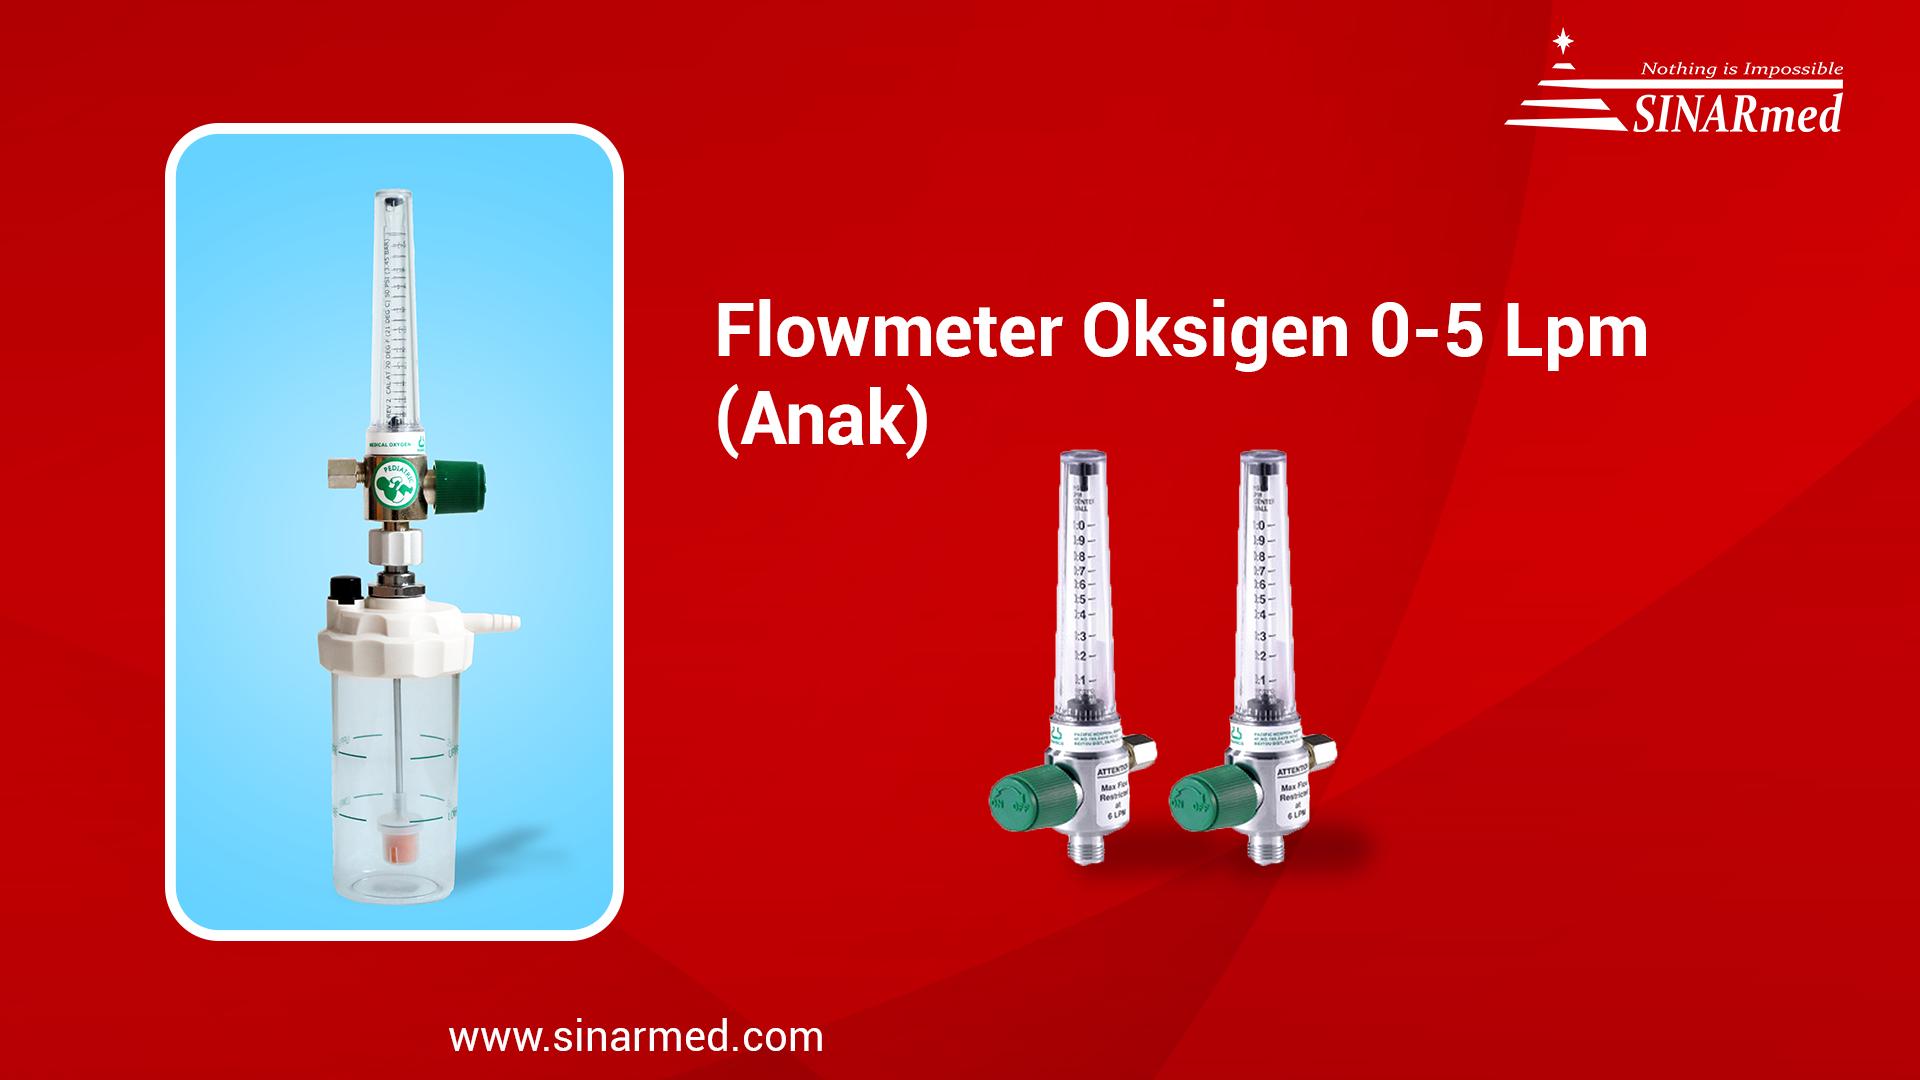 Flowmeter Oksigen 1-5 Lpm (Anak/pediatric) / Flowmeter Gas Medis / Respirometer / Regulator Oksigen